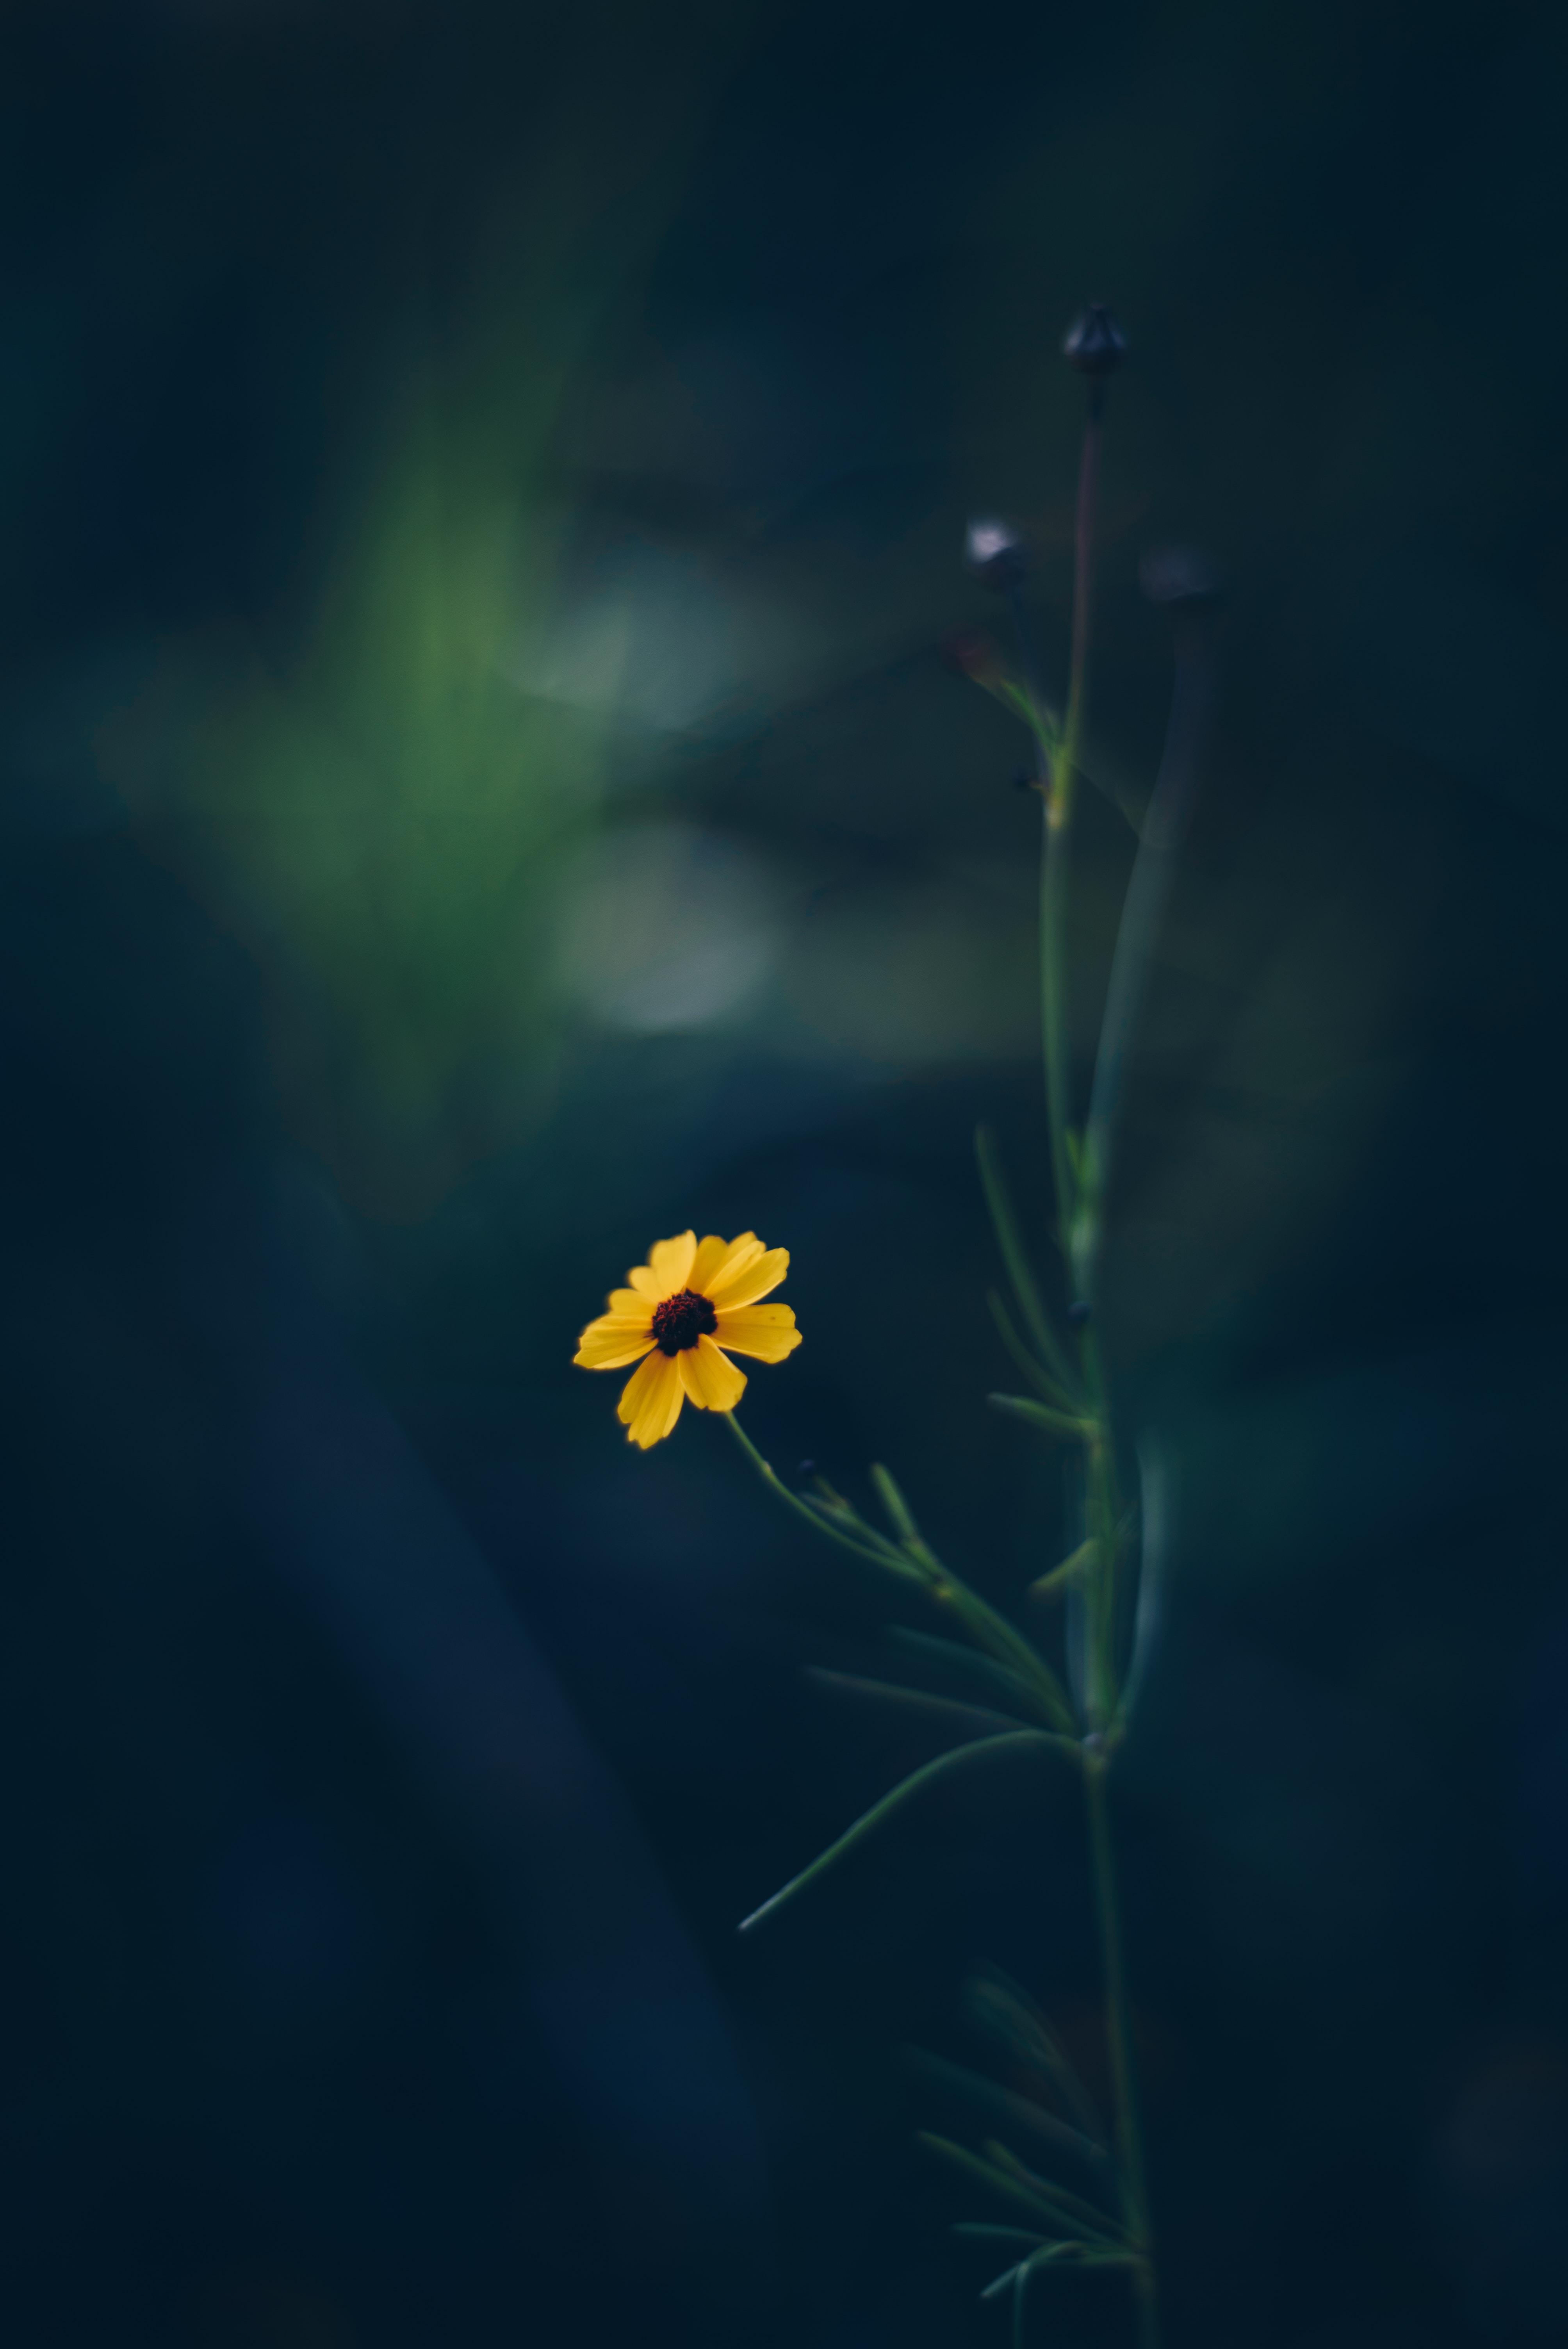 yellow petaled flower closeup photography